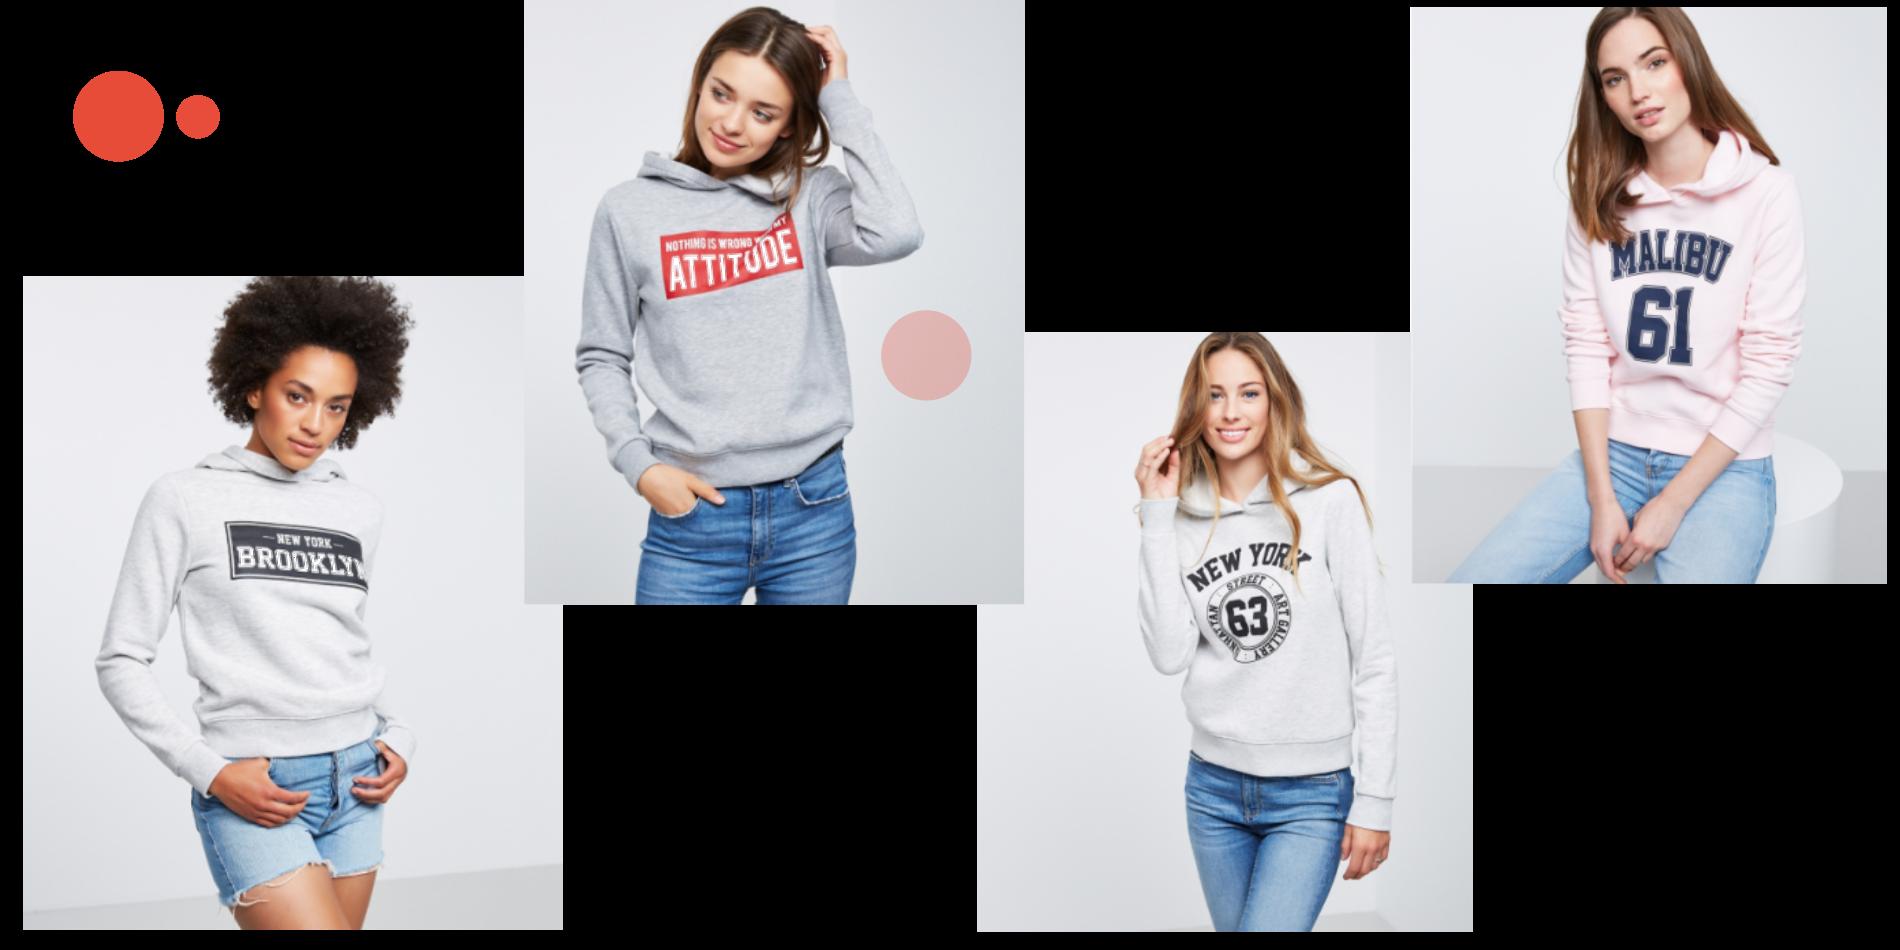 Ginas hoodies